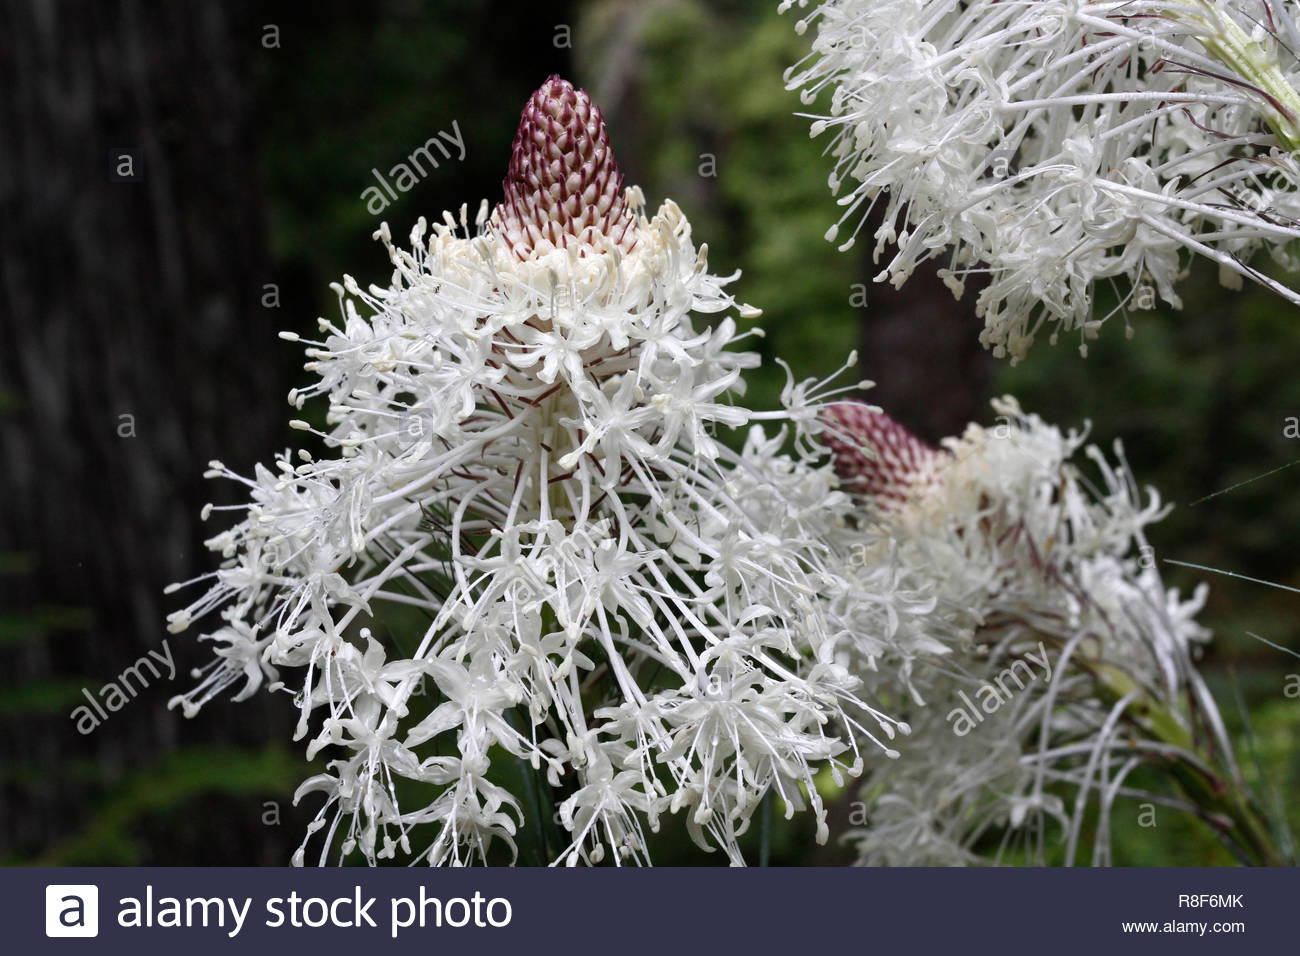 Beargrass (Xerophyllum tenax), Lookout Creek Trail, HJ Andrews Forest, Willamette National Forest, Oregon, USA Stock Photo